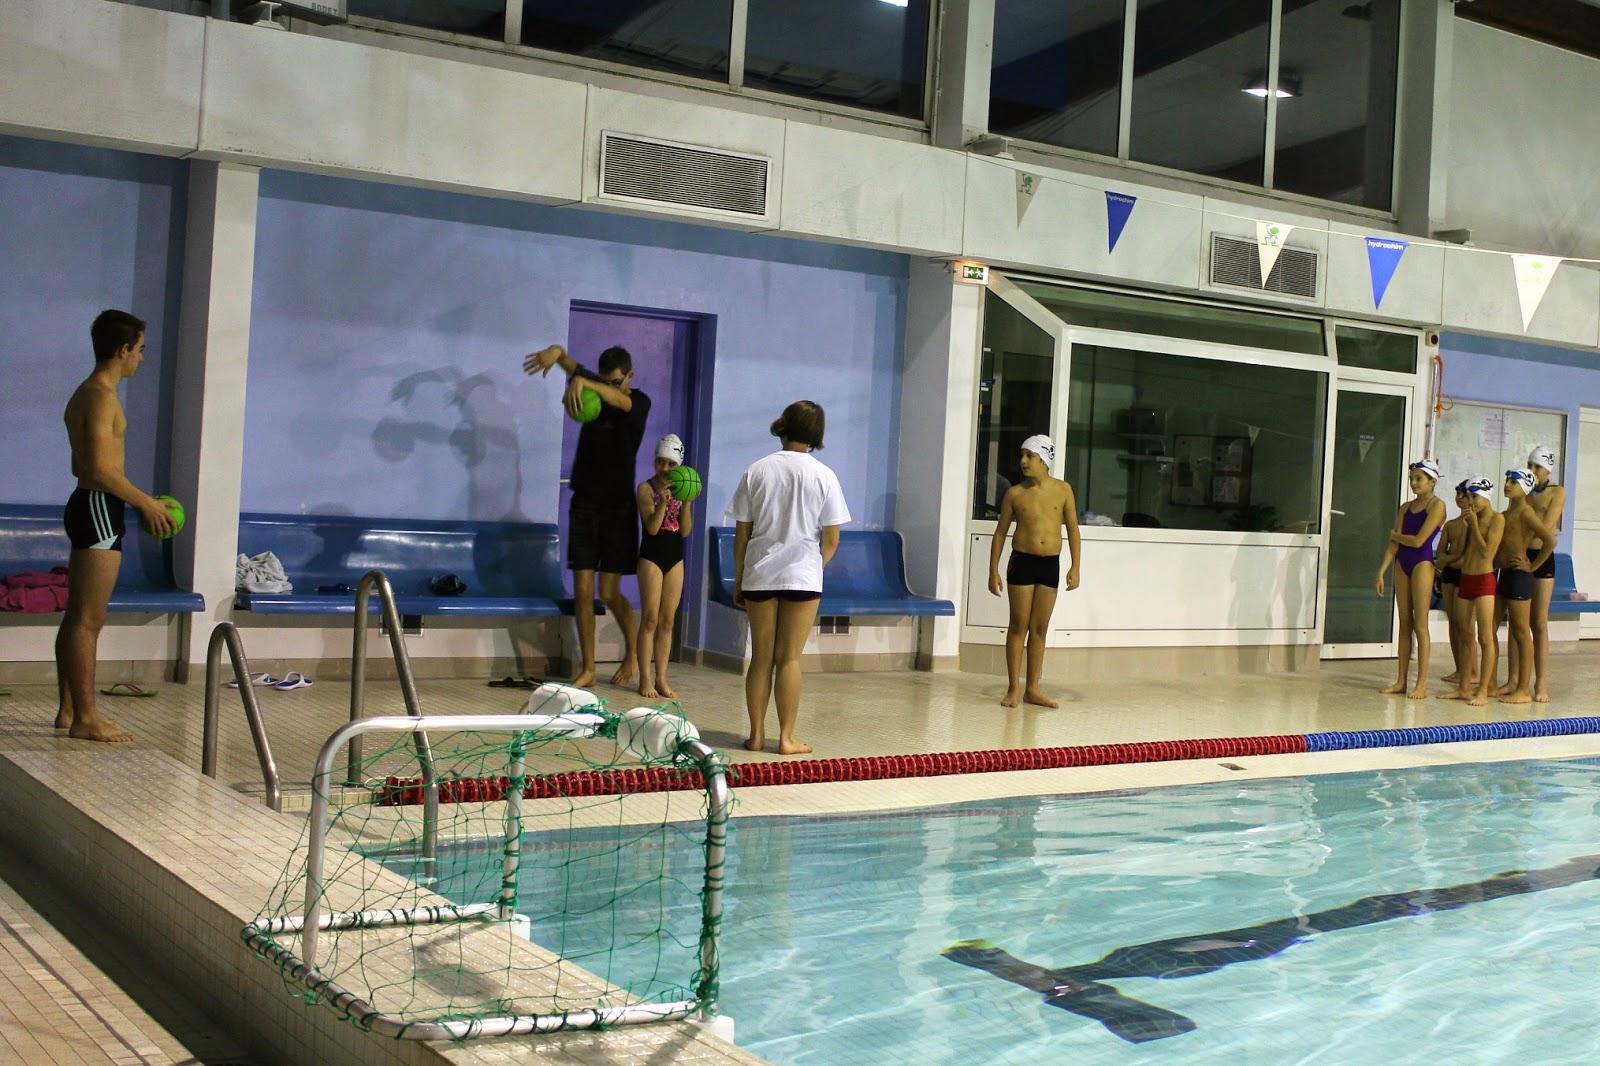 U s s p natation 01 11 14 01 12 14 for Piscine gilbert bozon